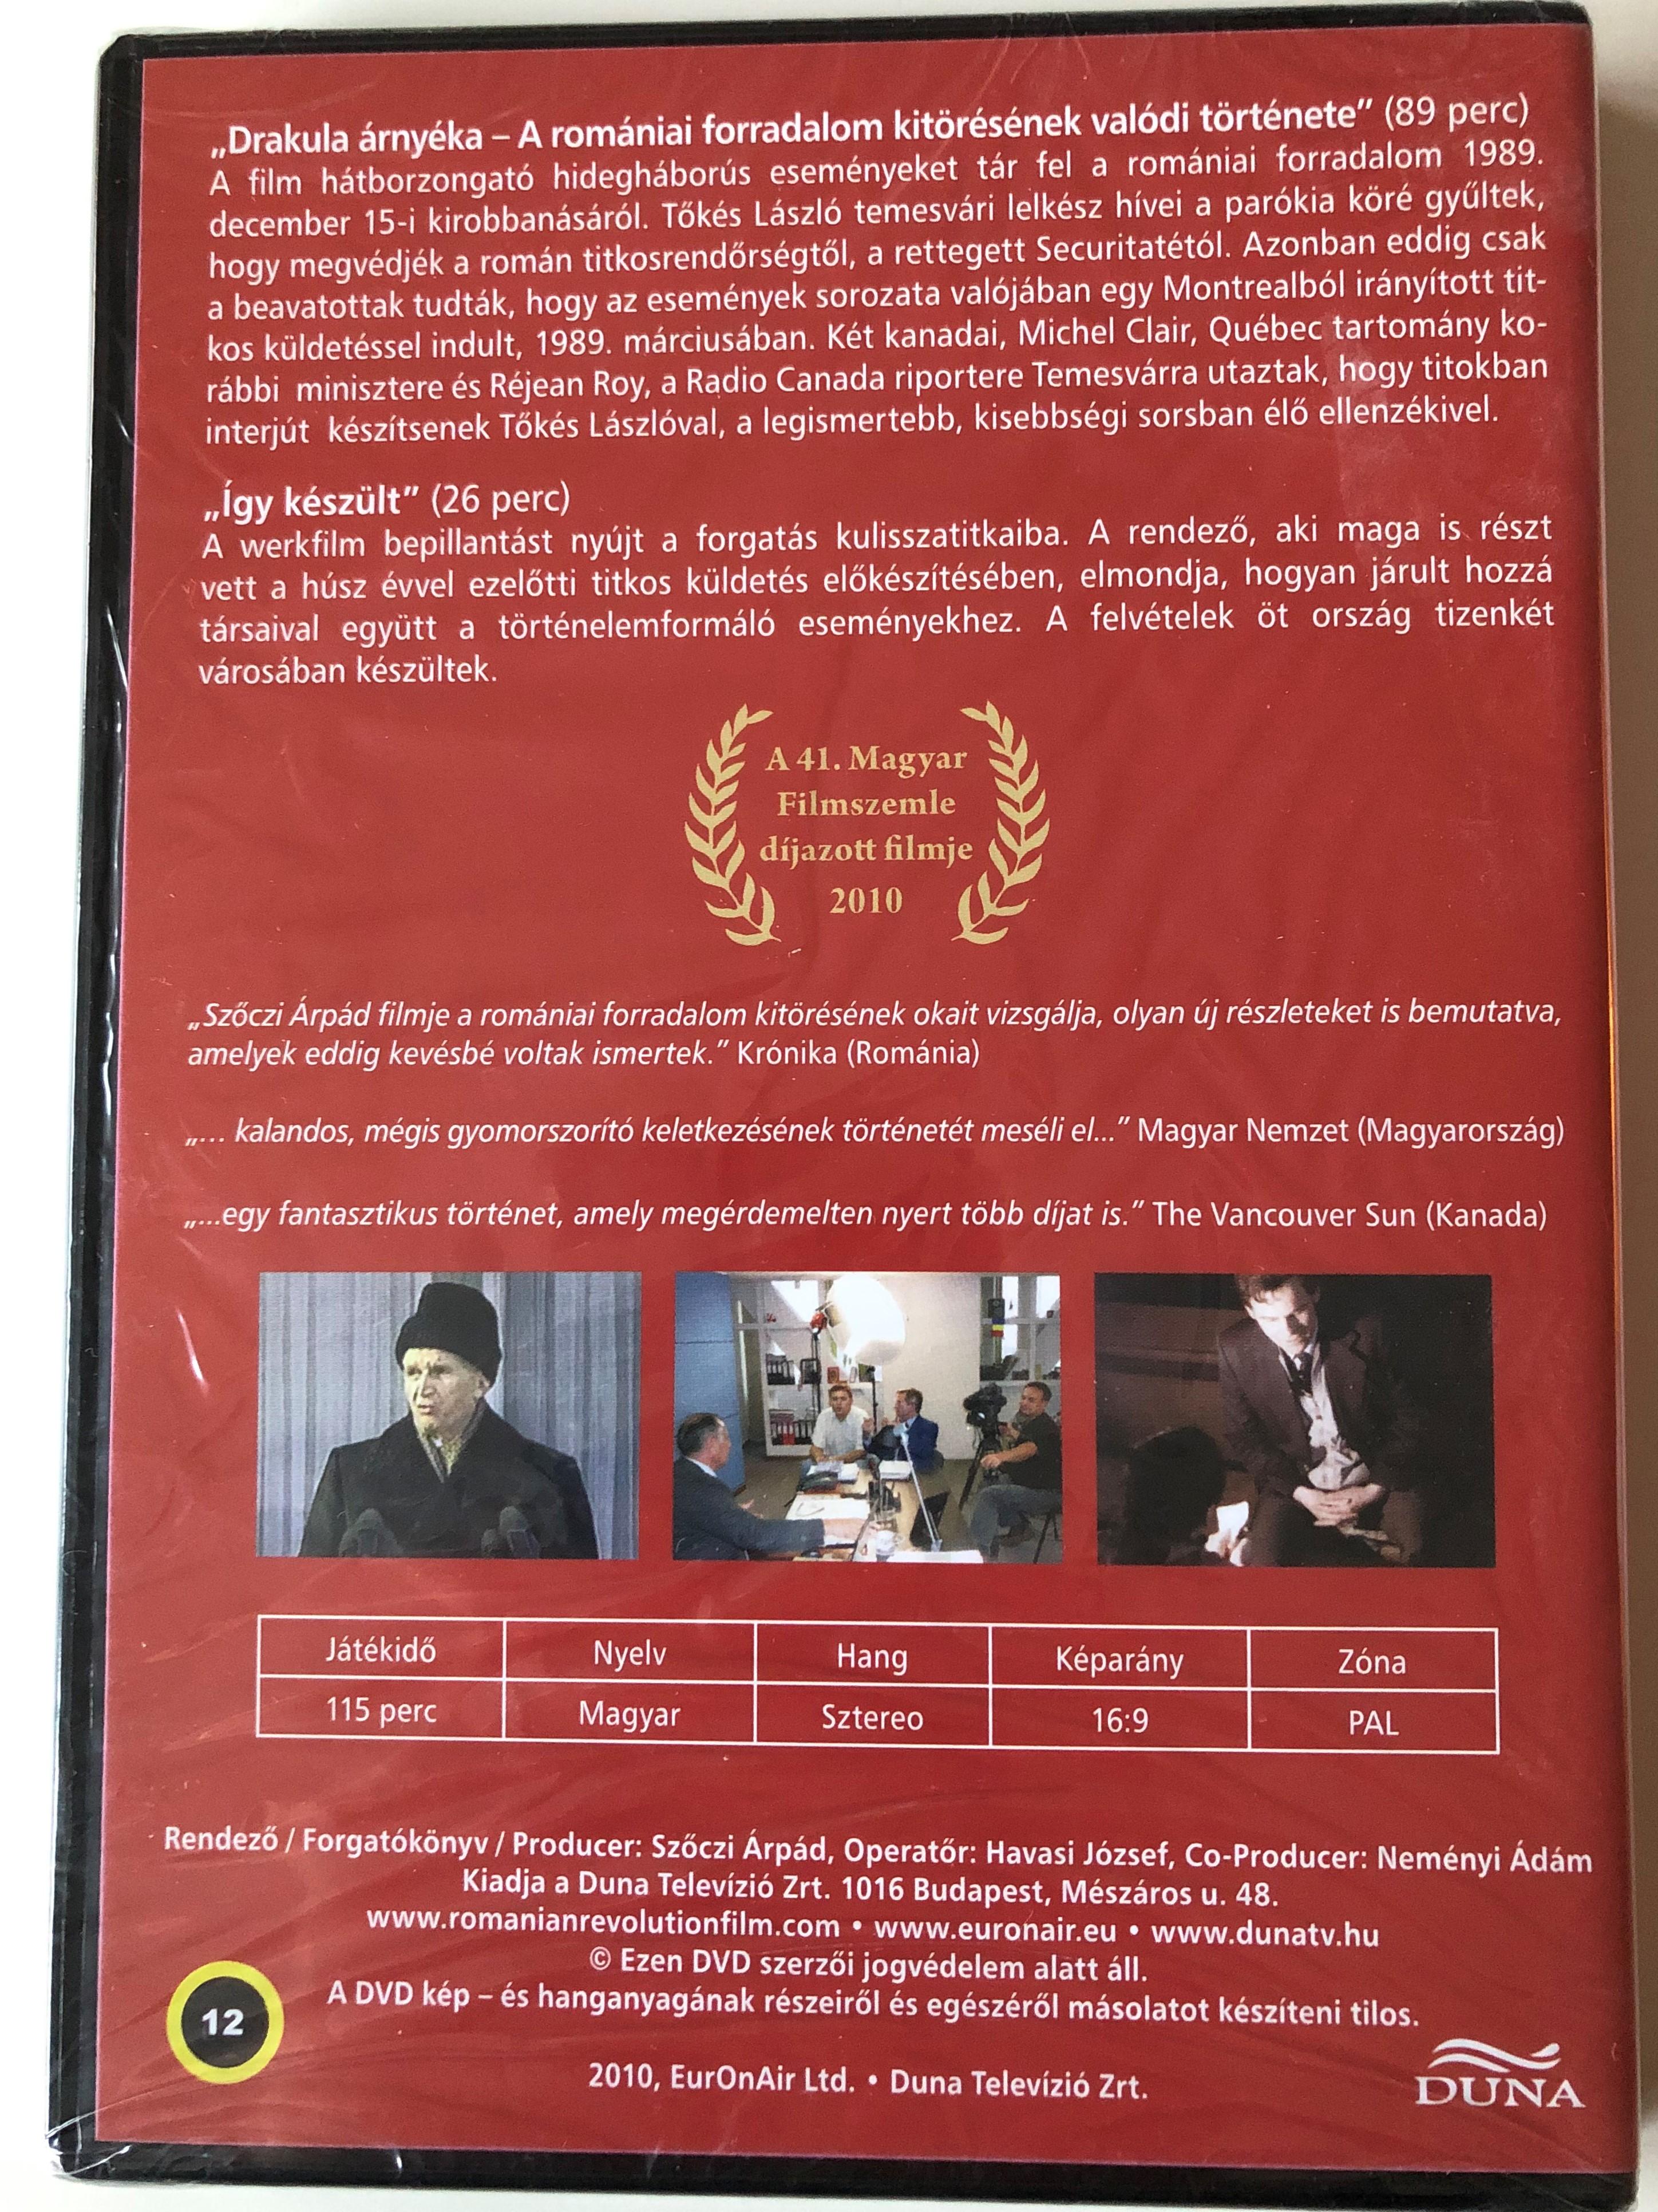 drakula-rny-ka-1.-dvd-2009-the-shadow-of-dracula-part-1-2.jpg